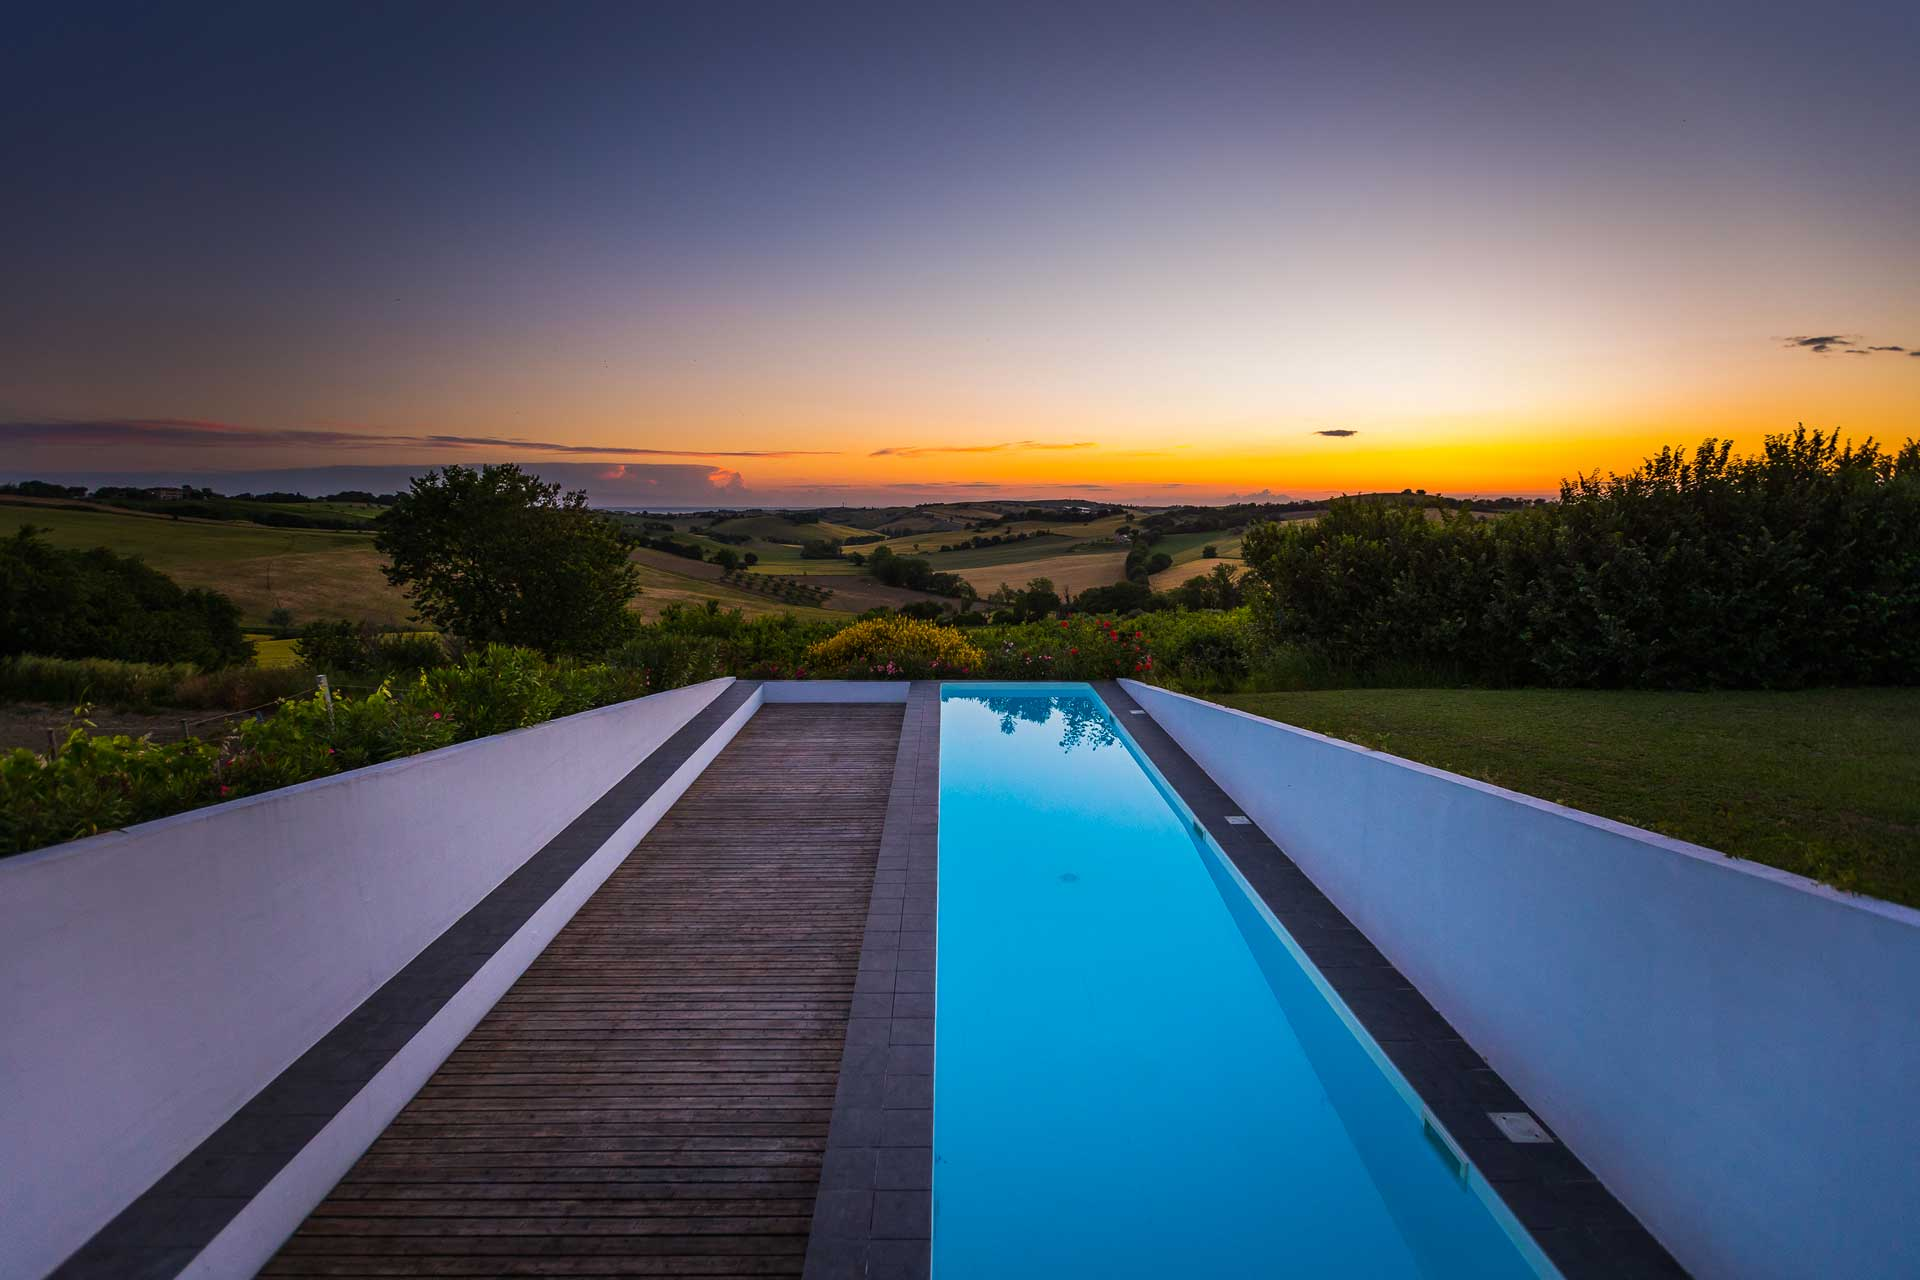 Panorama alba piscina scoperta